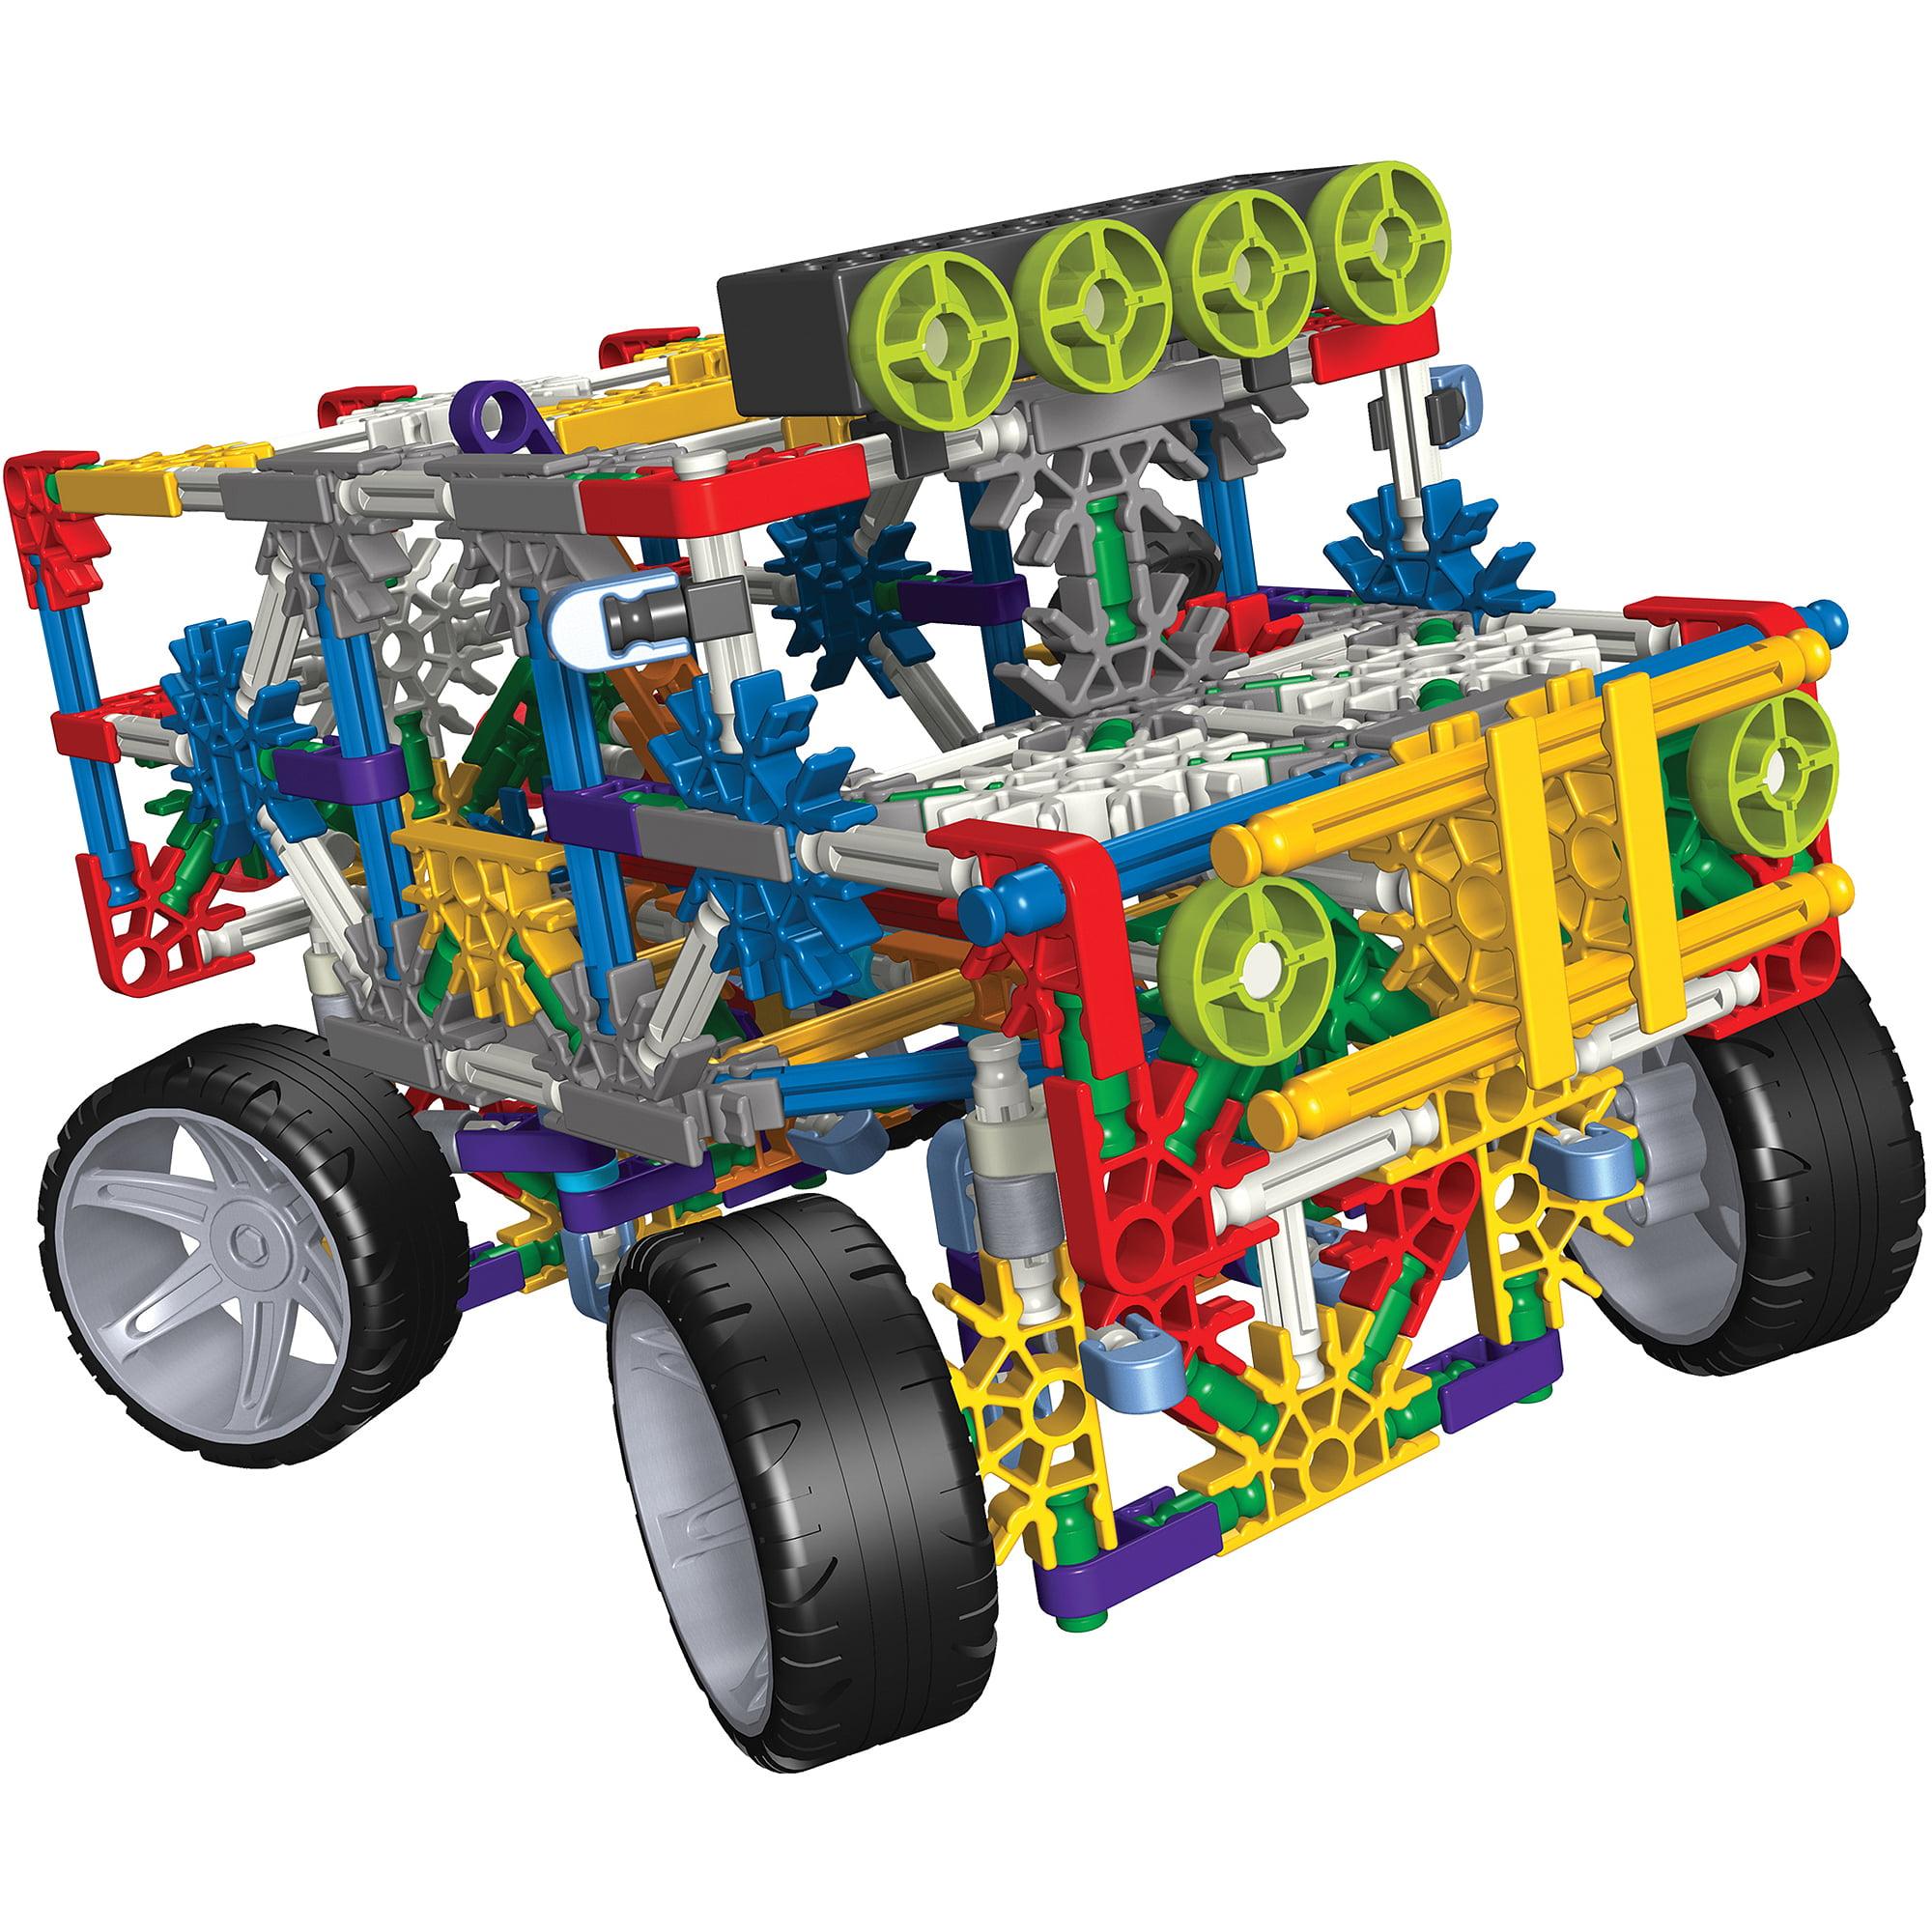 K'NEX 4 Wheel Drive Truck Building Set